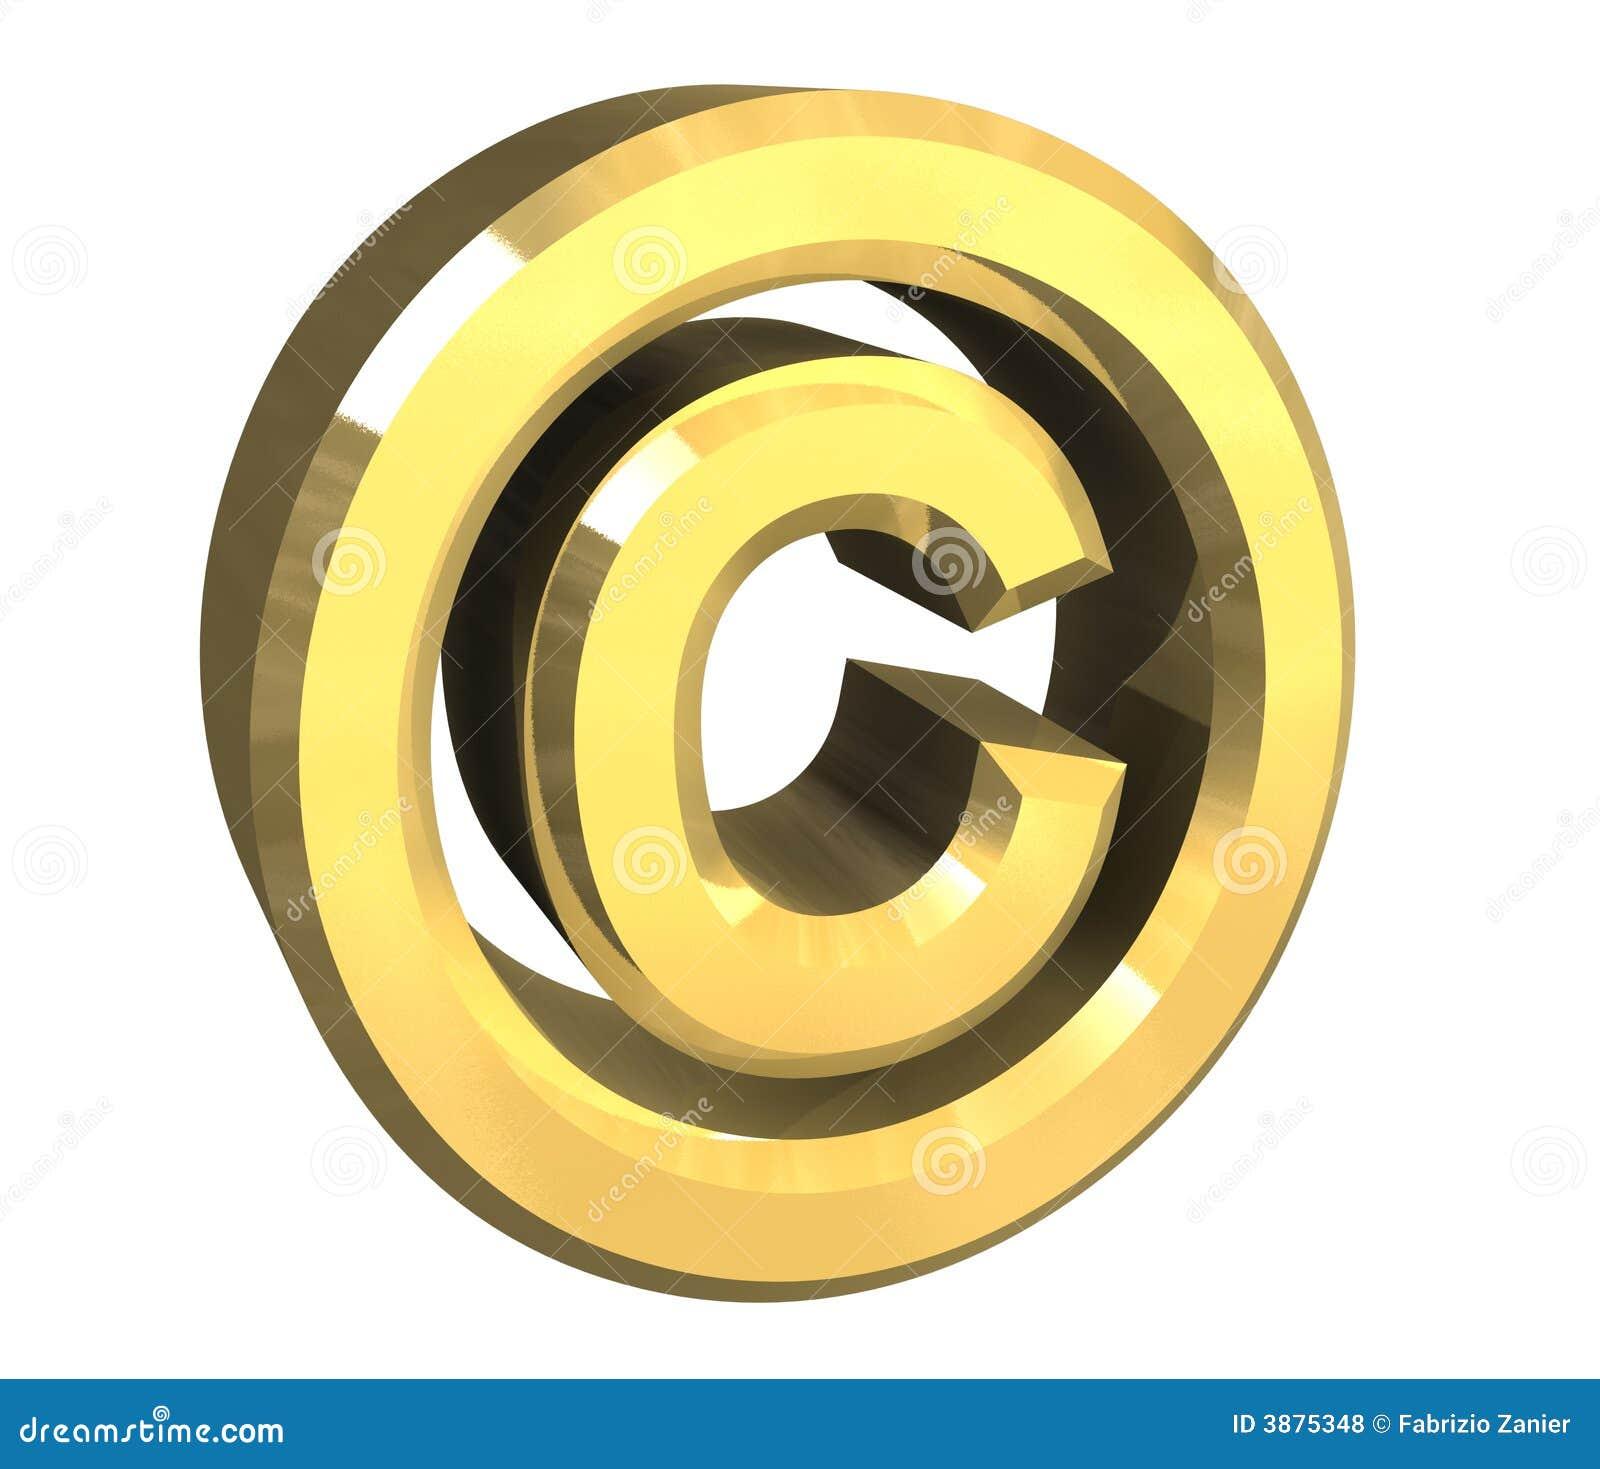 Copyright Symbol In Gold 3d Illustration 3875348 Megapixl